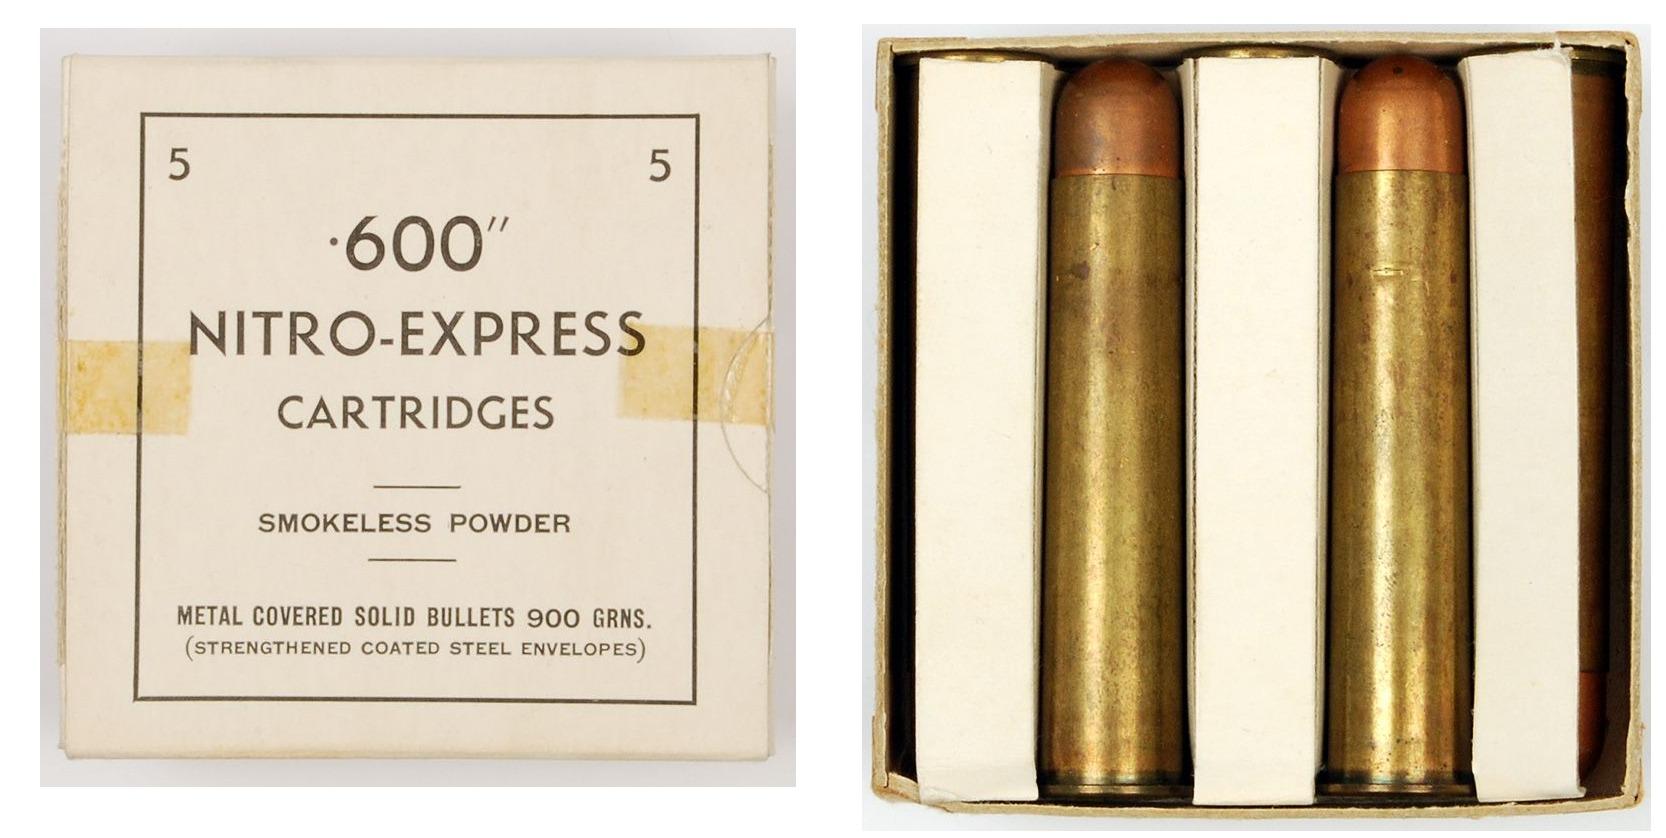 Nitro Express cartridges